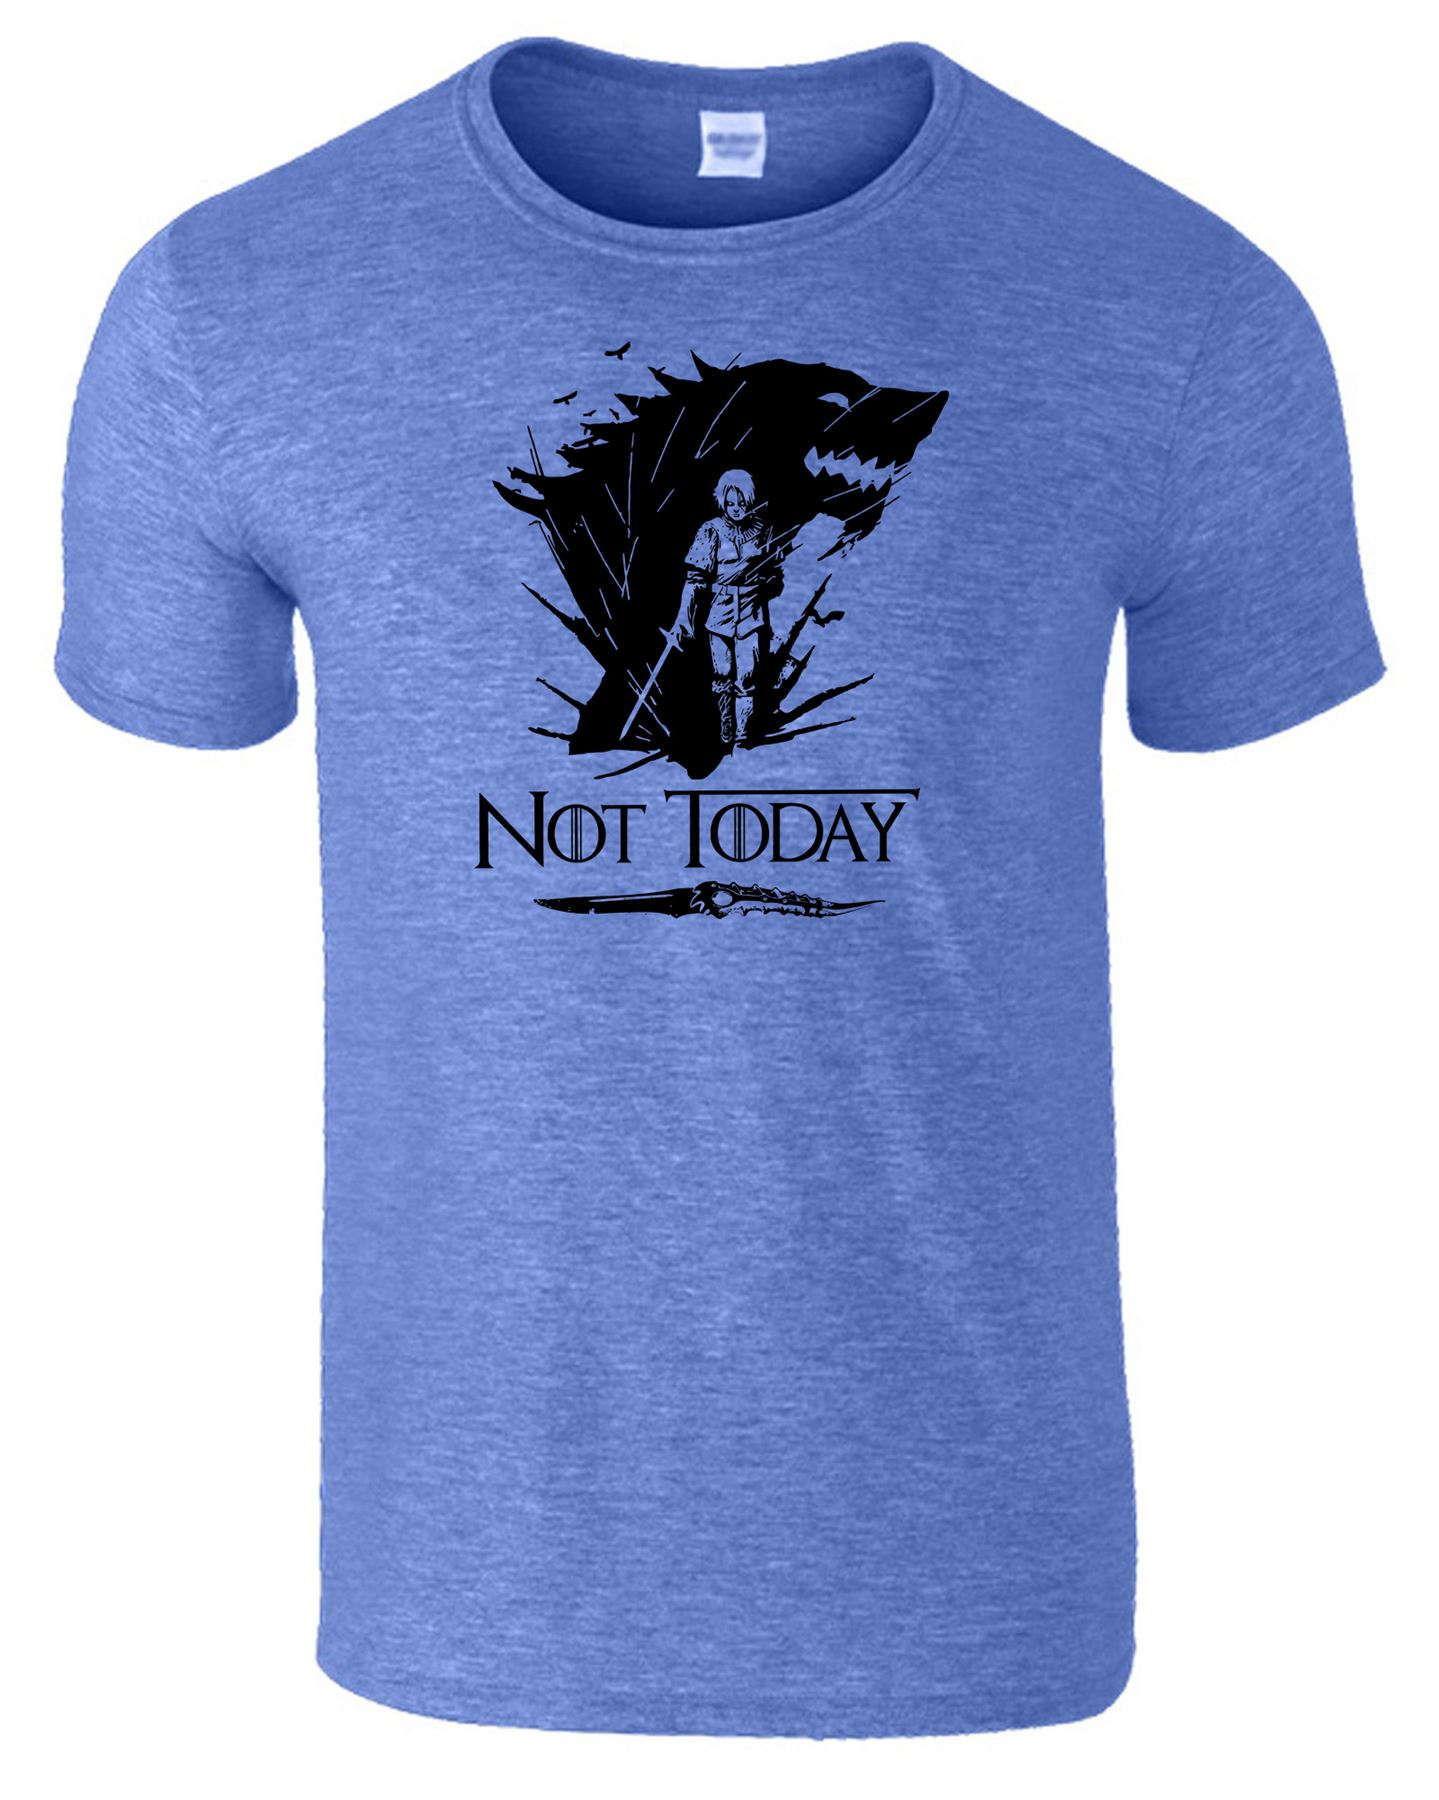 Arya-Stark-Not-Today-T-Shirt-Mens-Game-Season-Womens-Shirt-Adults-Unisex-Fit Indexbild 20